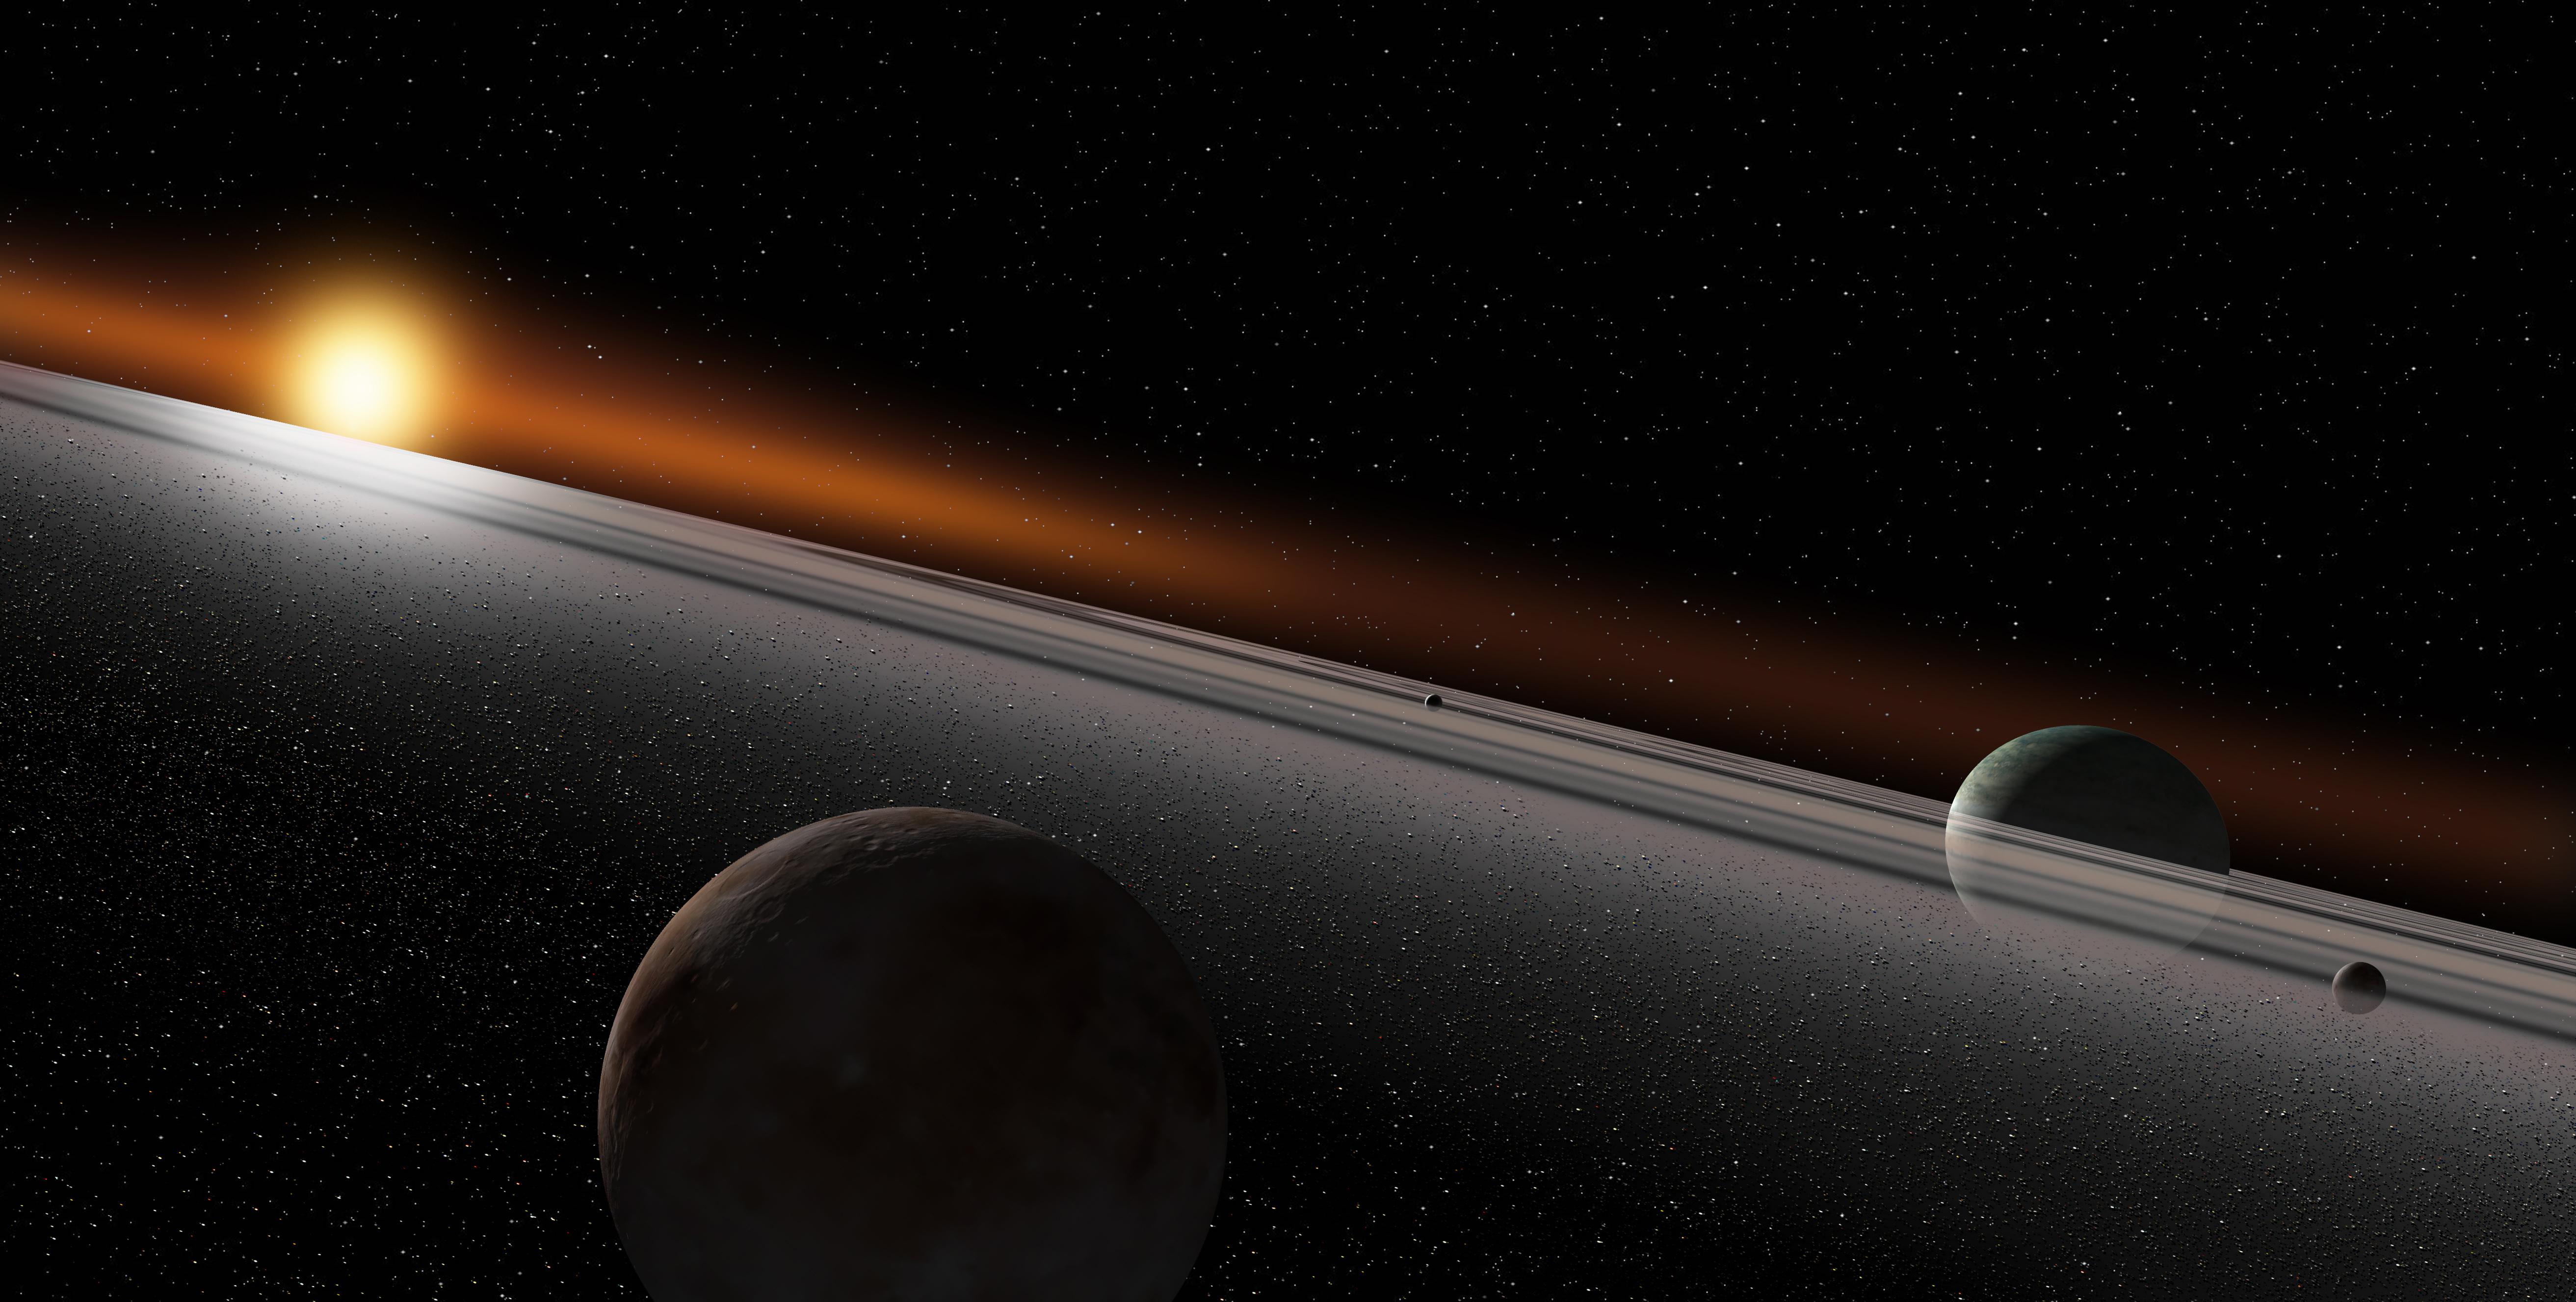 Exoplaneta com aneis. Imagem: Ron Miller/NASAblueshift